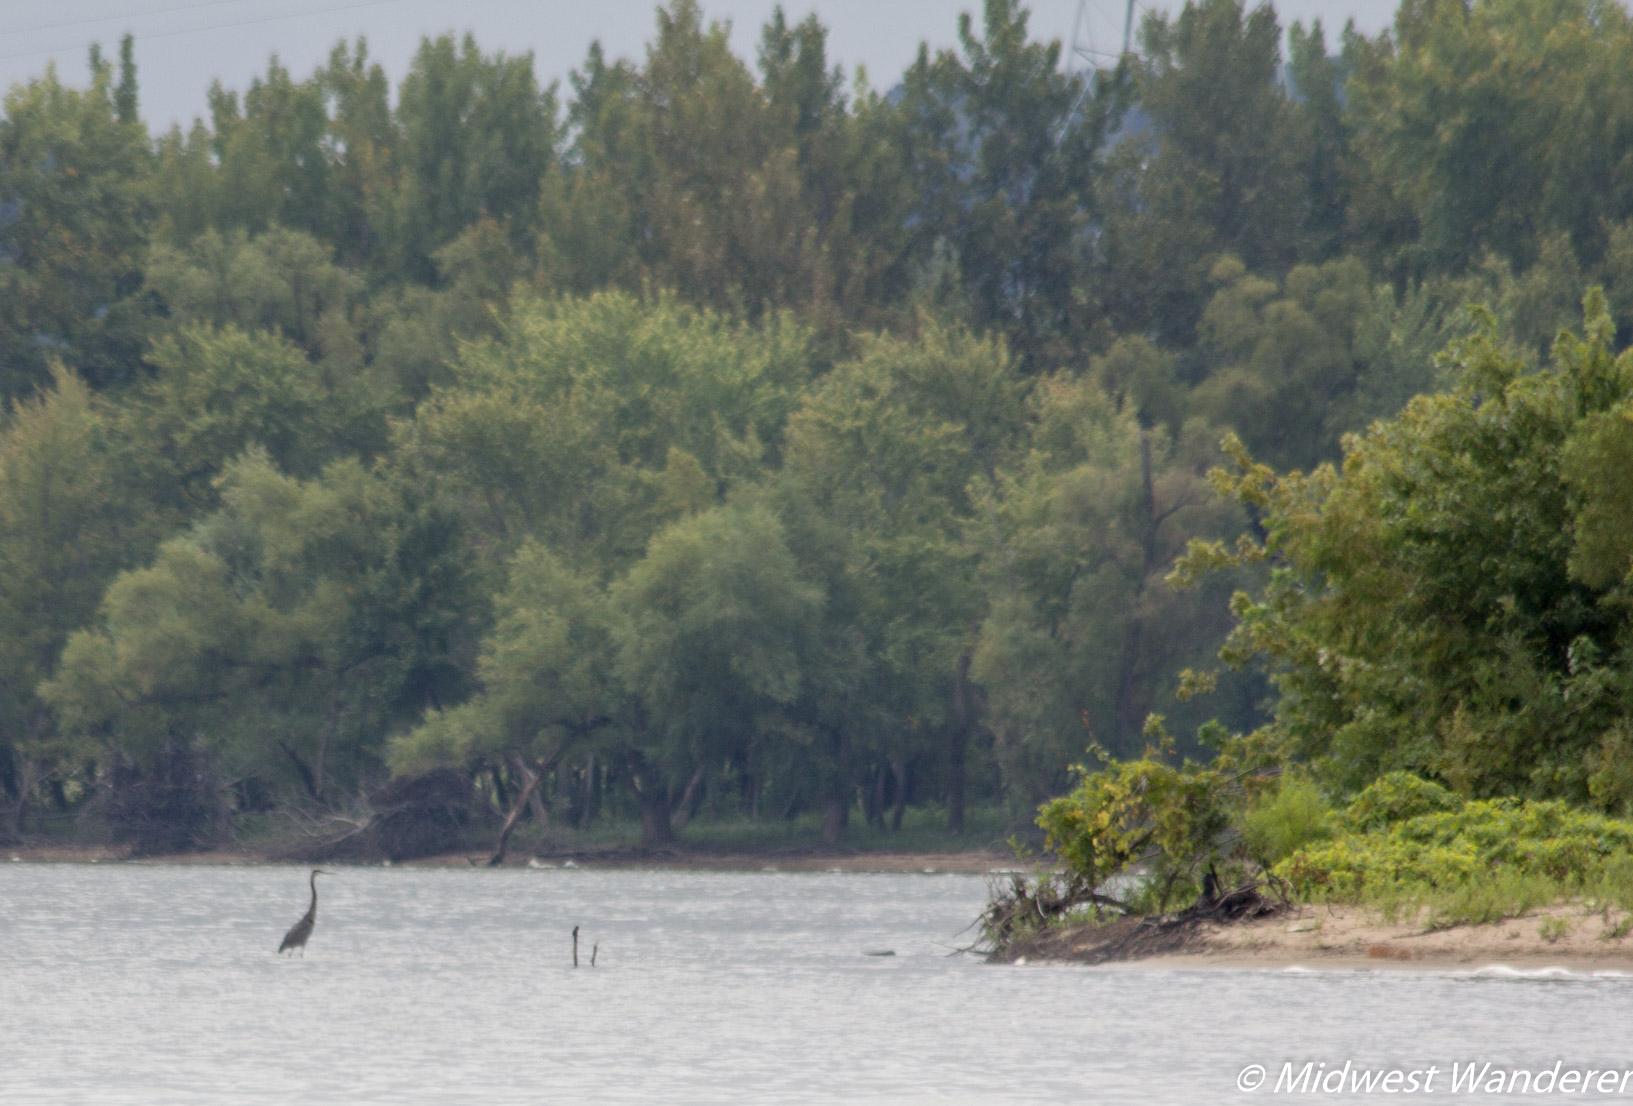 Wildlife on the Illinois River